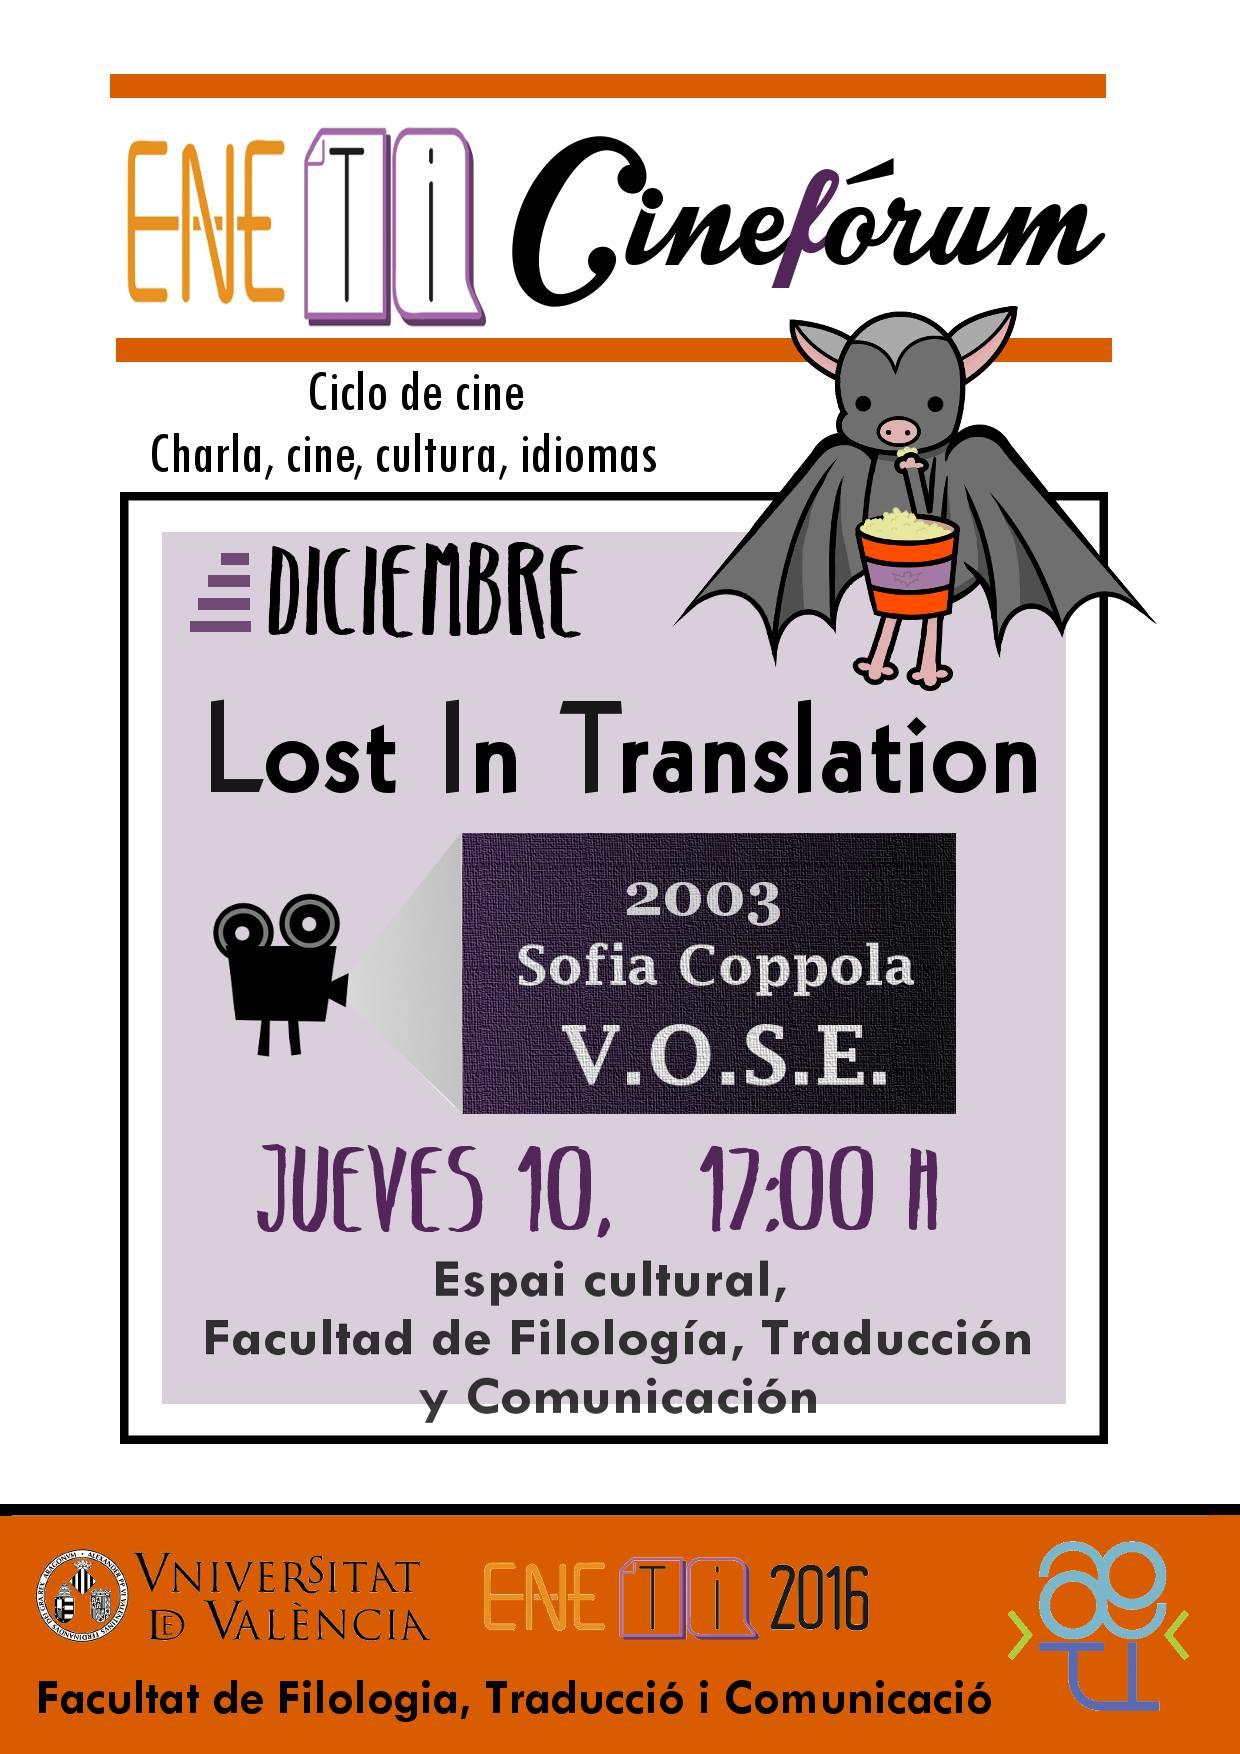 Cineforum Eneti: Lost in Translation